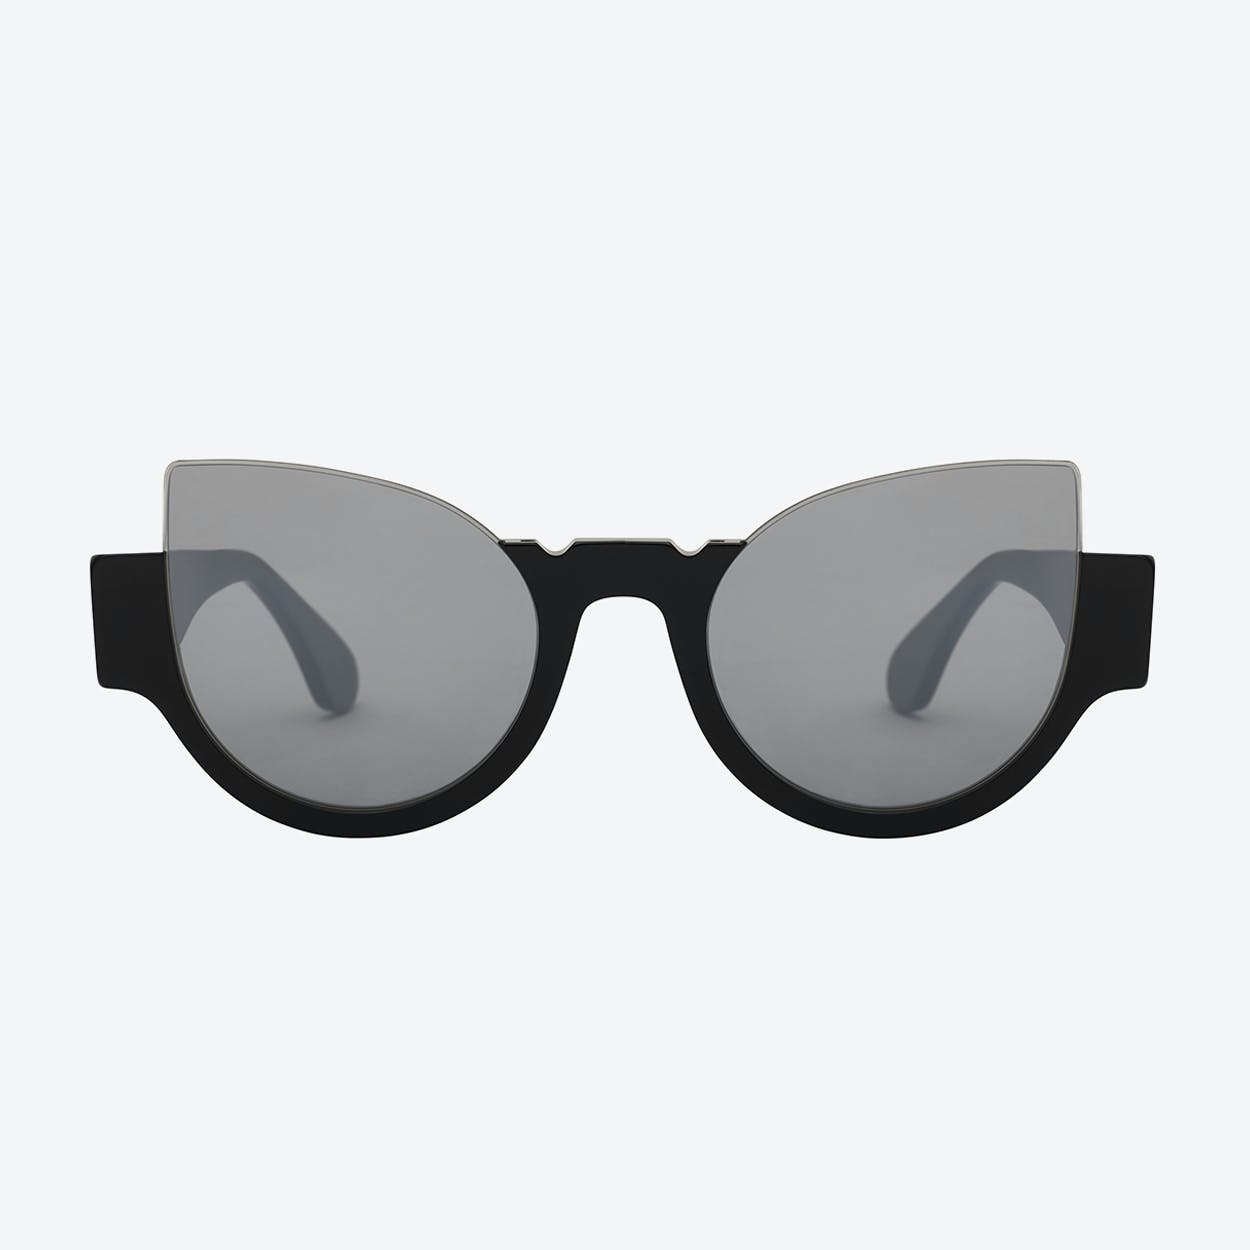 Wiley Sunglasses in Black